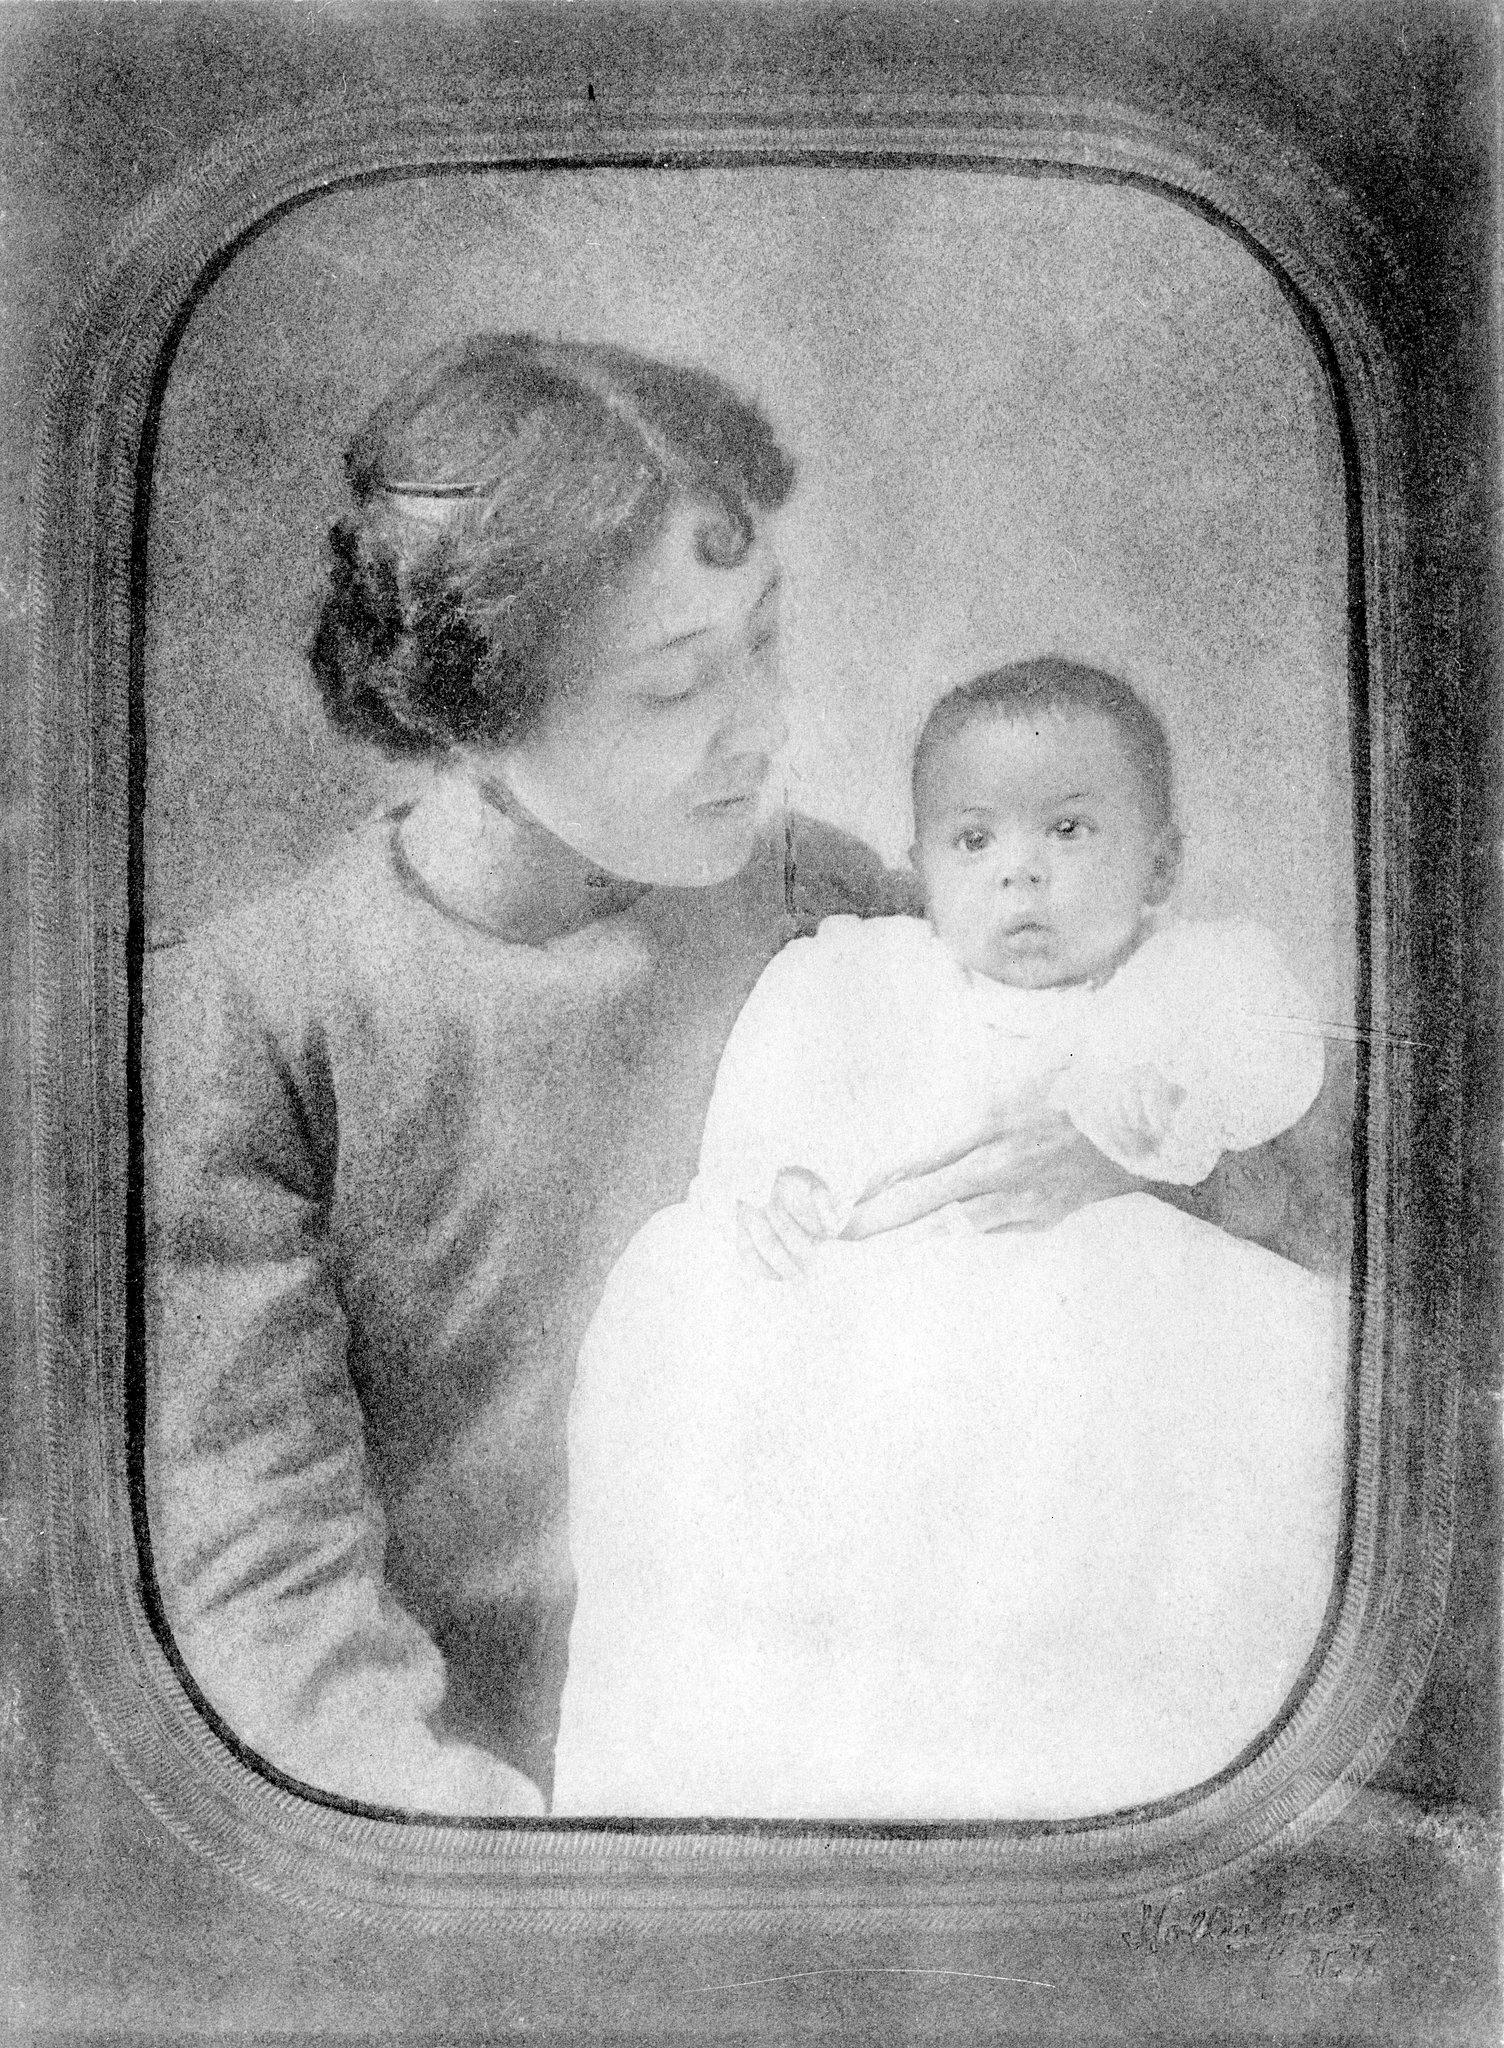 Langston Hughes Baby Photo